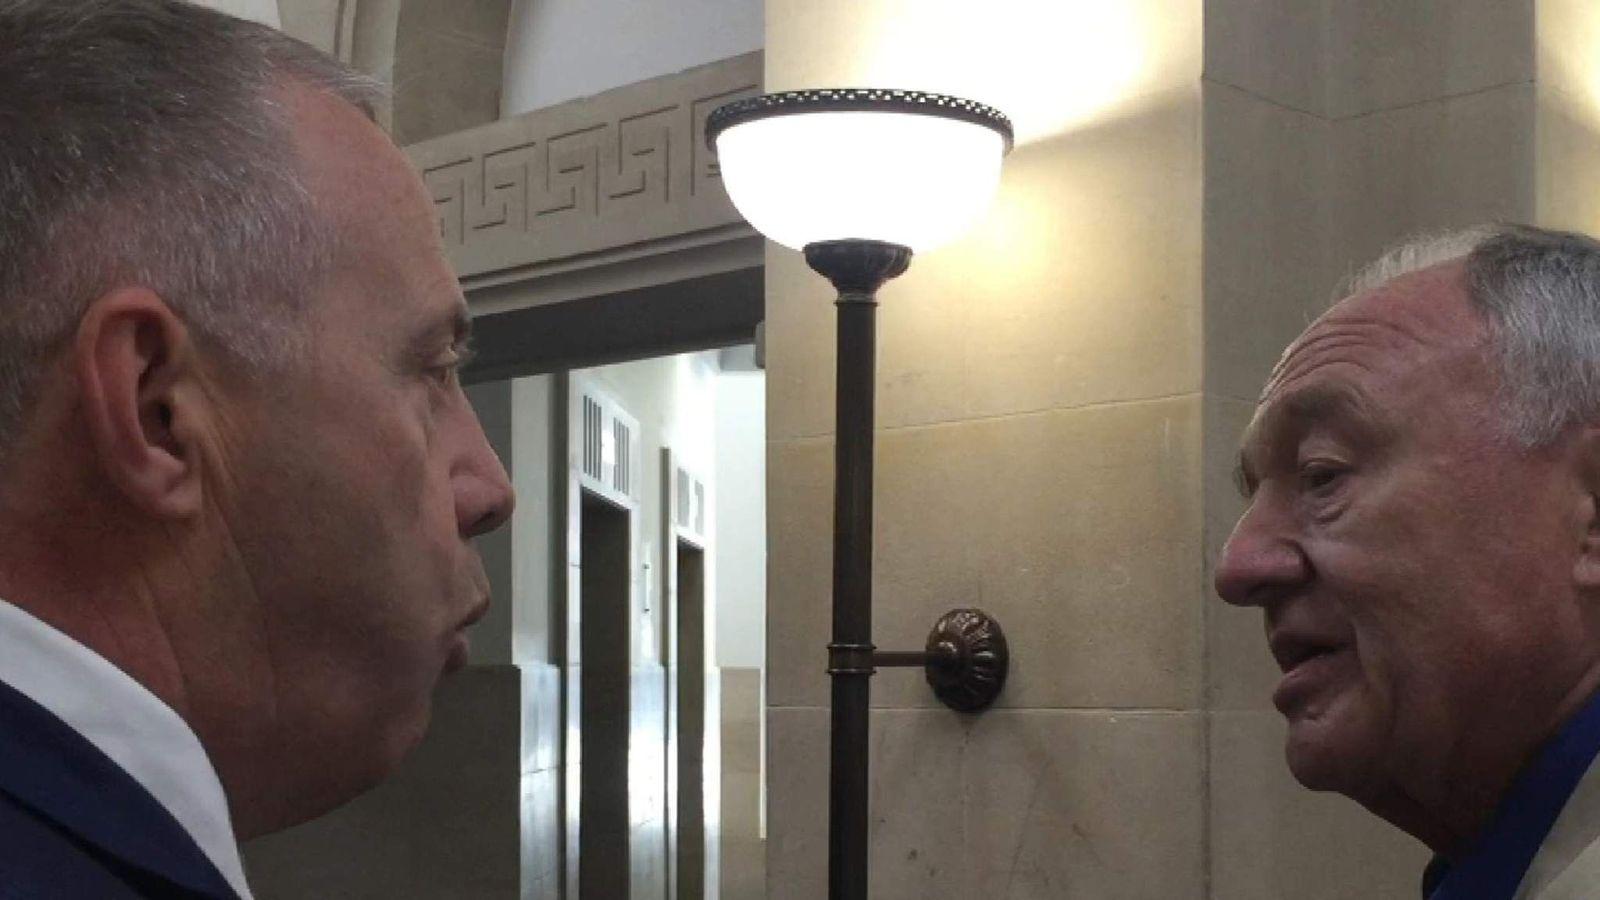 Ken Livingstone Encounters John Mann On Staircase Over Anti-Semite Comments